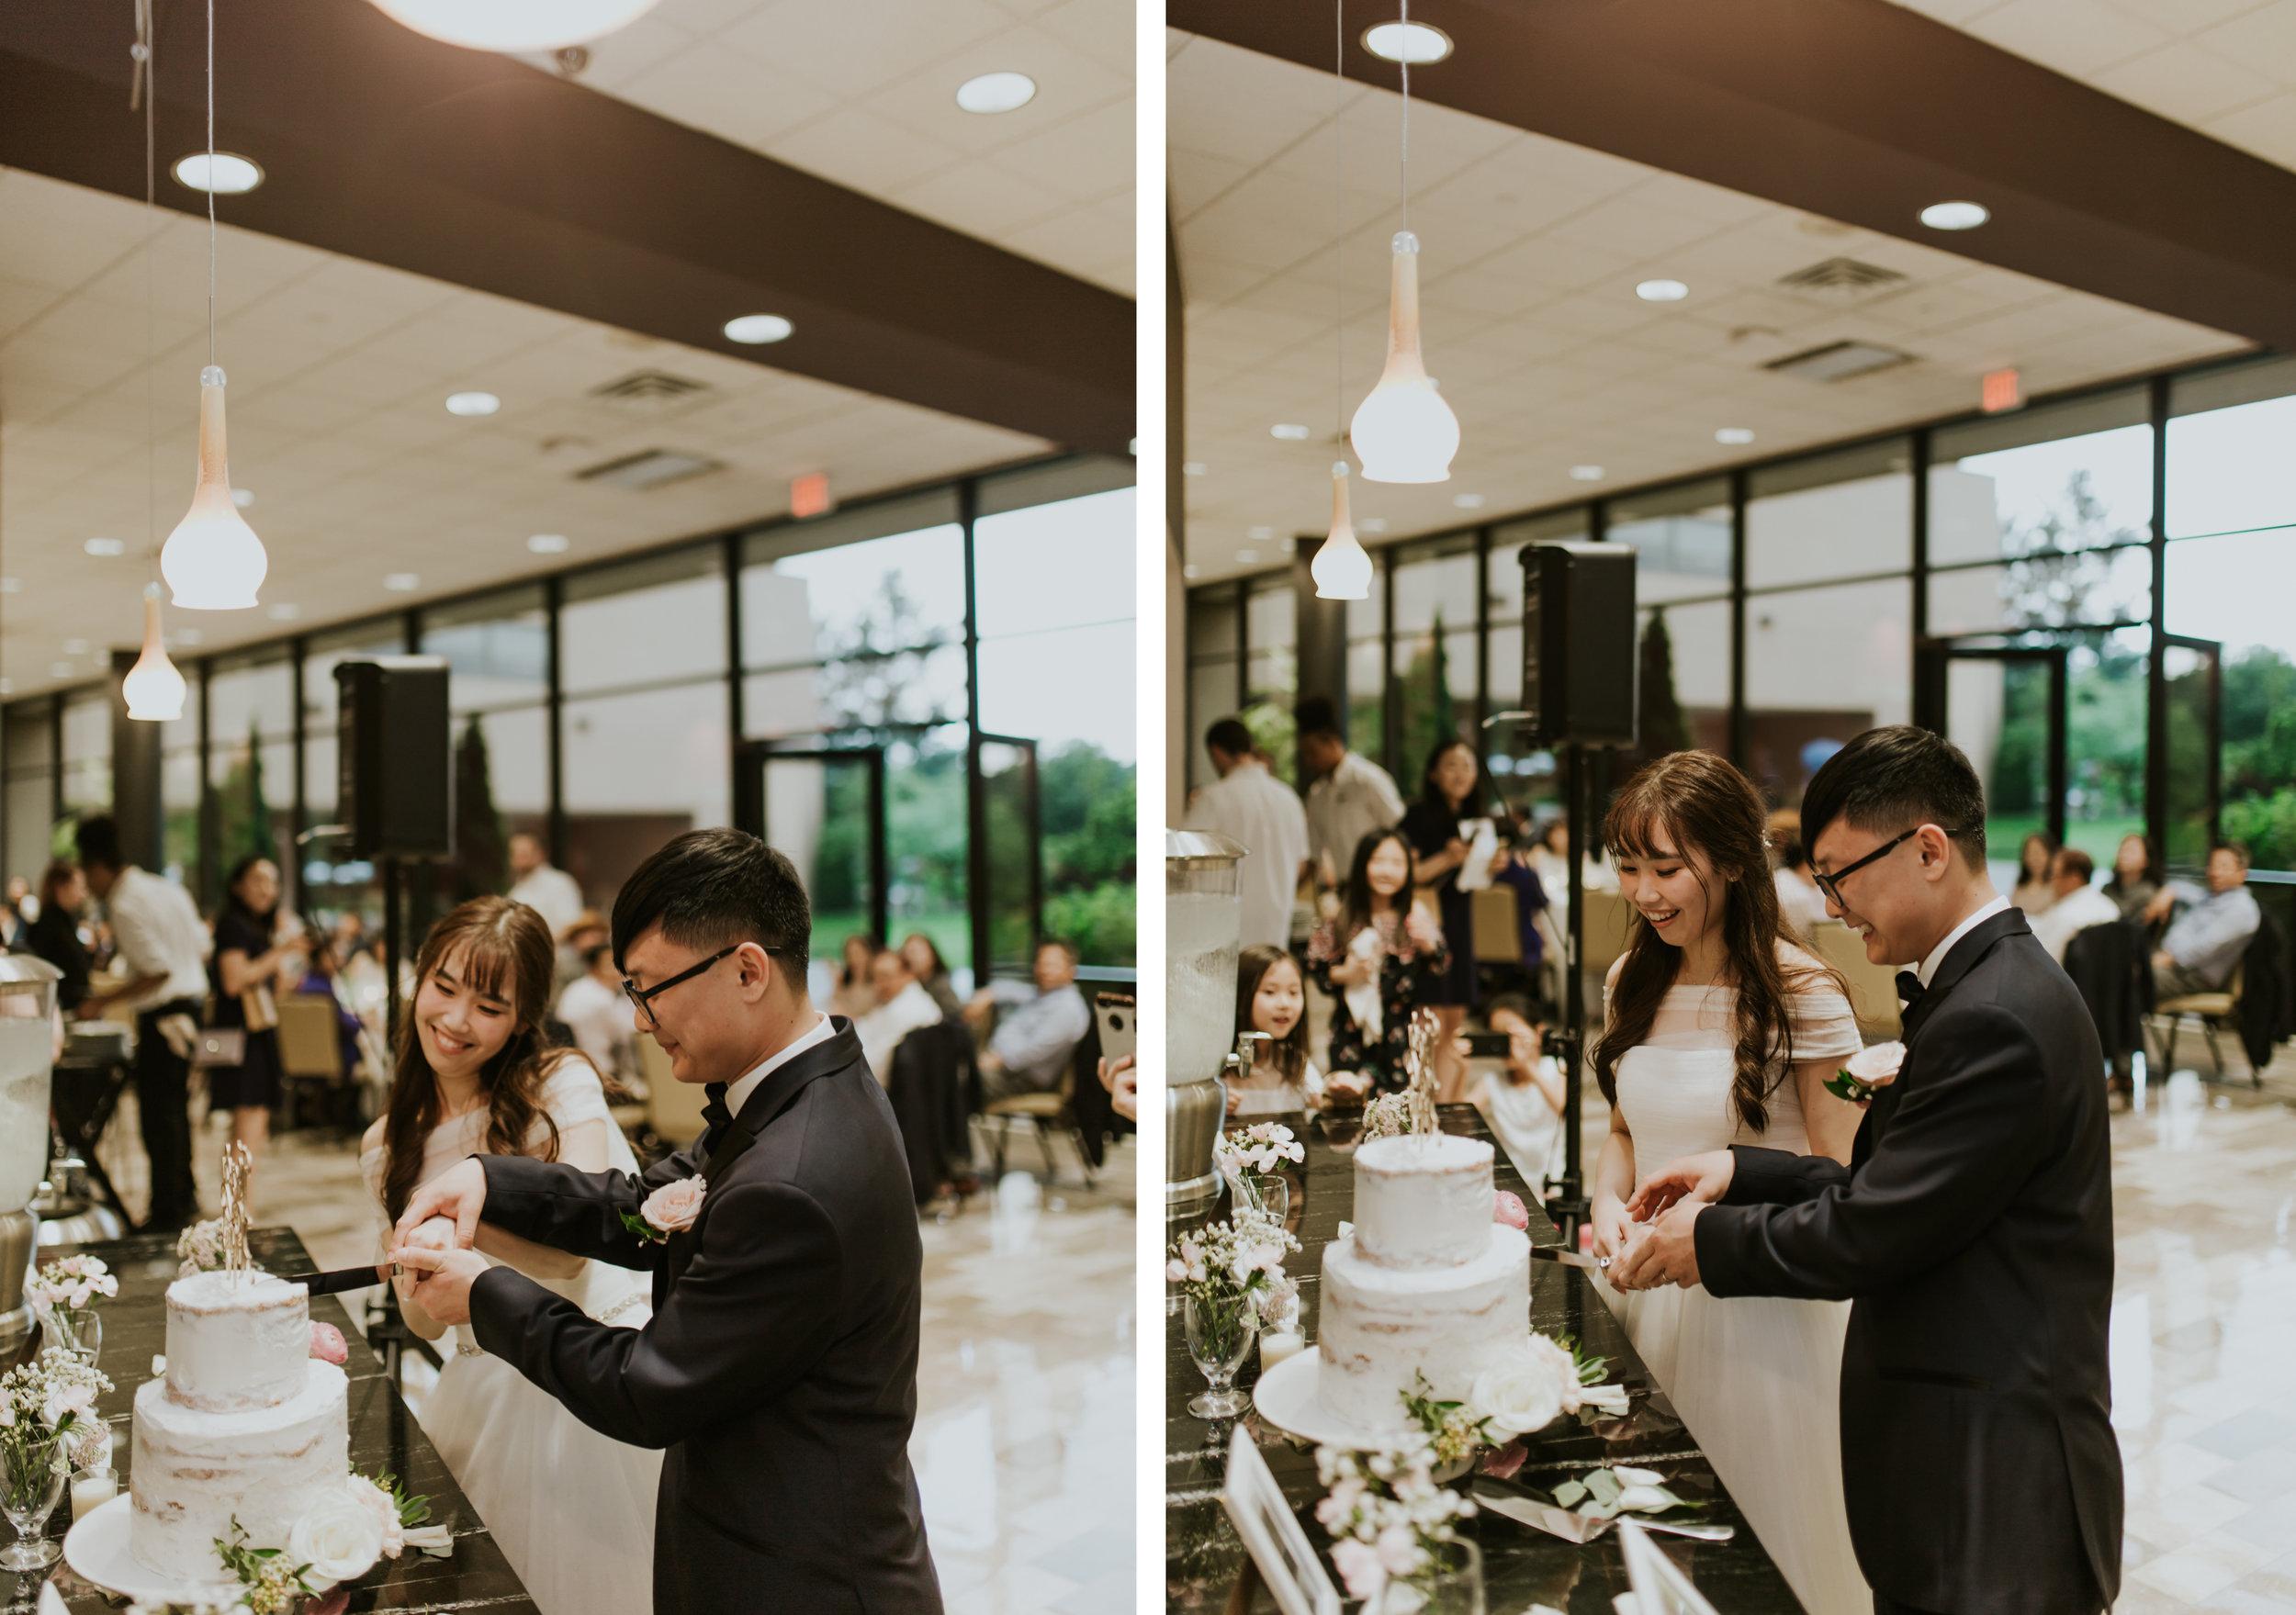 LGP-ann-arbor-eagle-crest-wedding-067.jpg